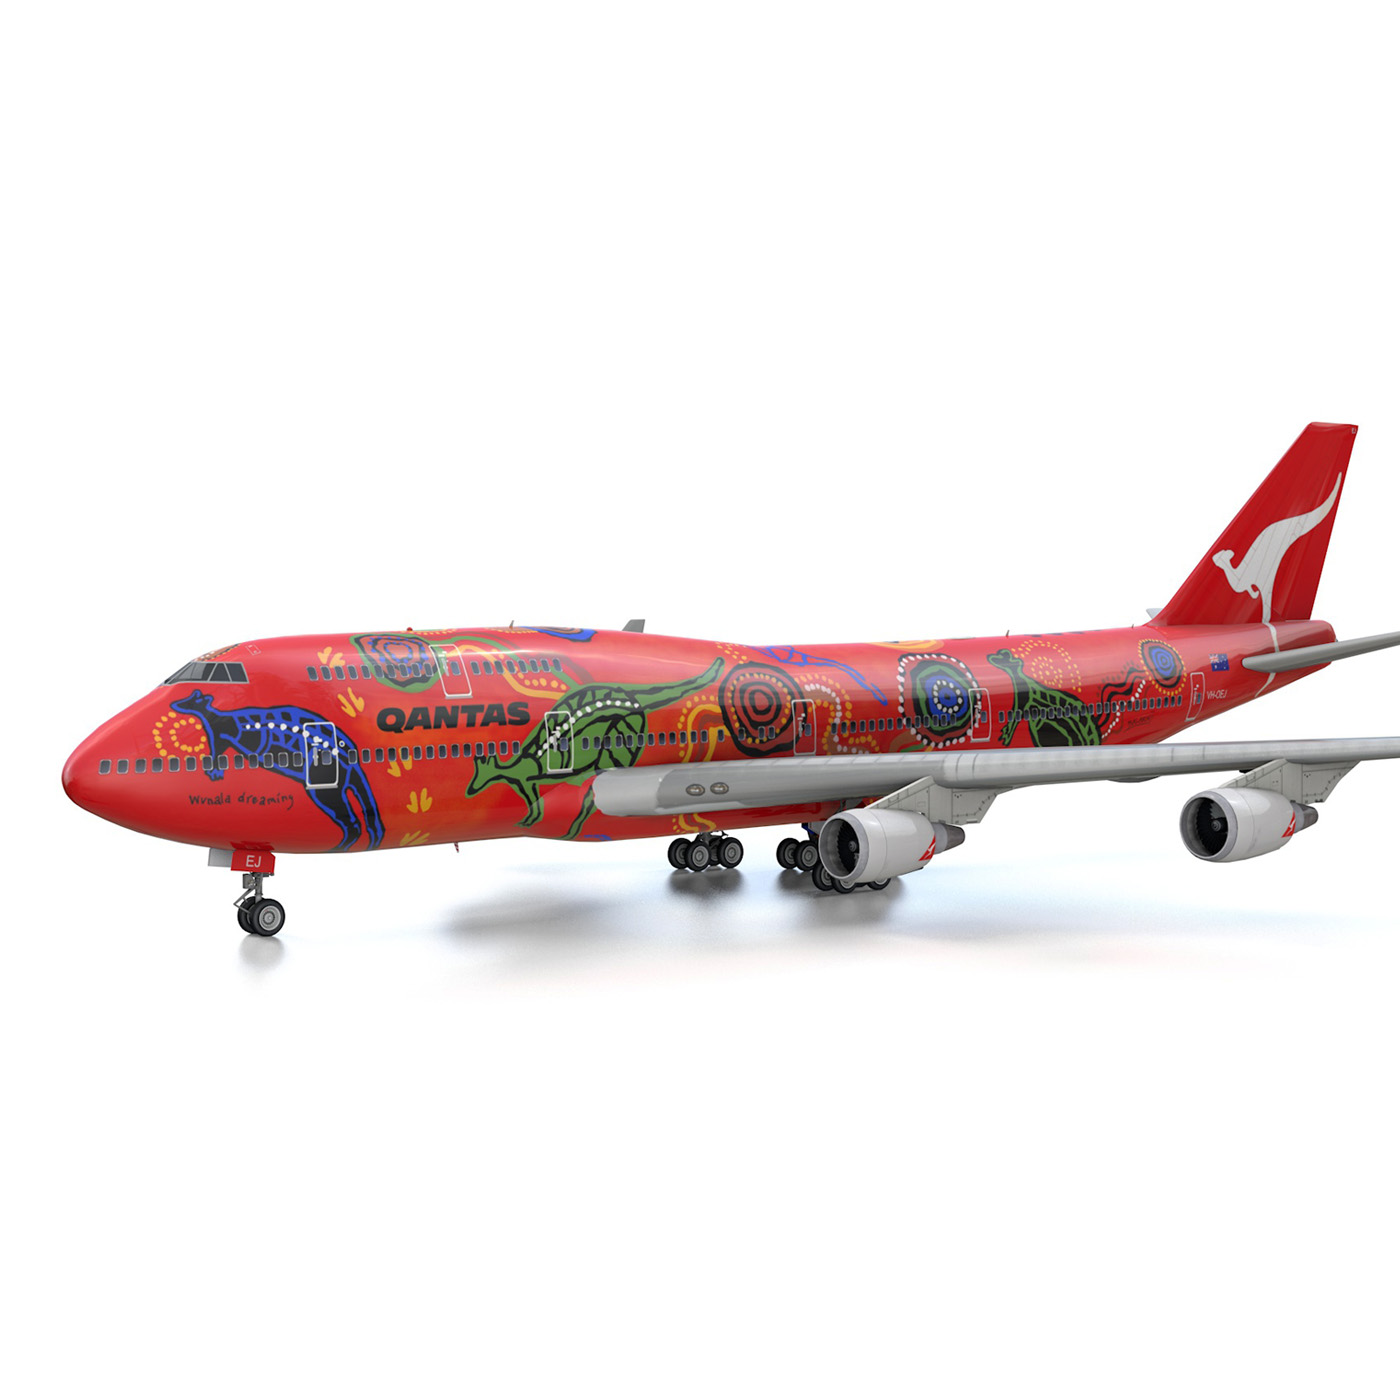 boeing 747 qantas wunala dreaming 3d model 3ds fbx c4d lwo obj 281788